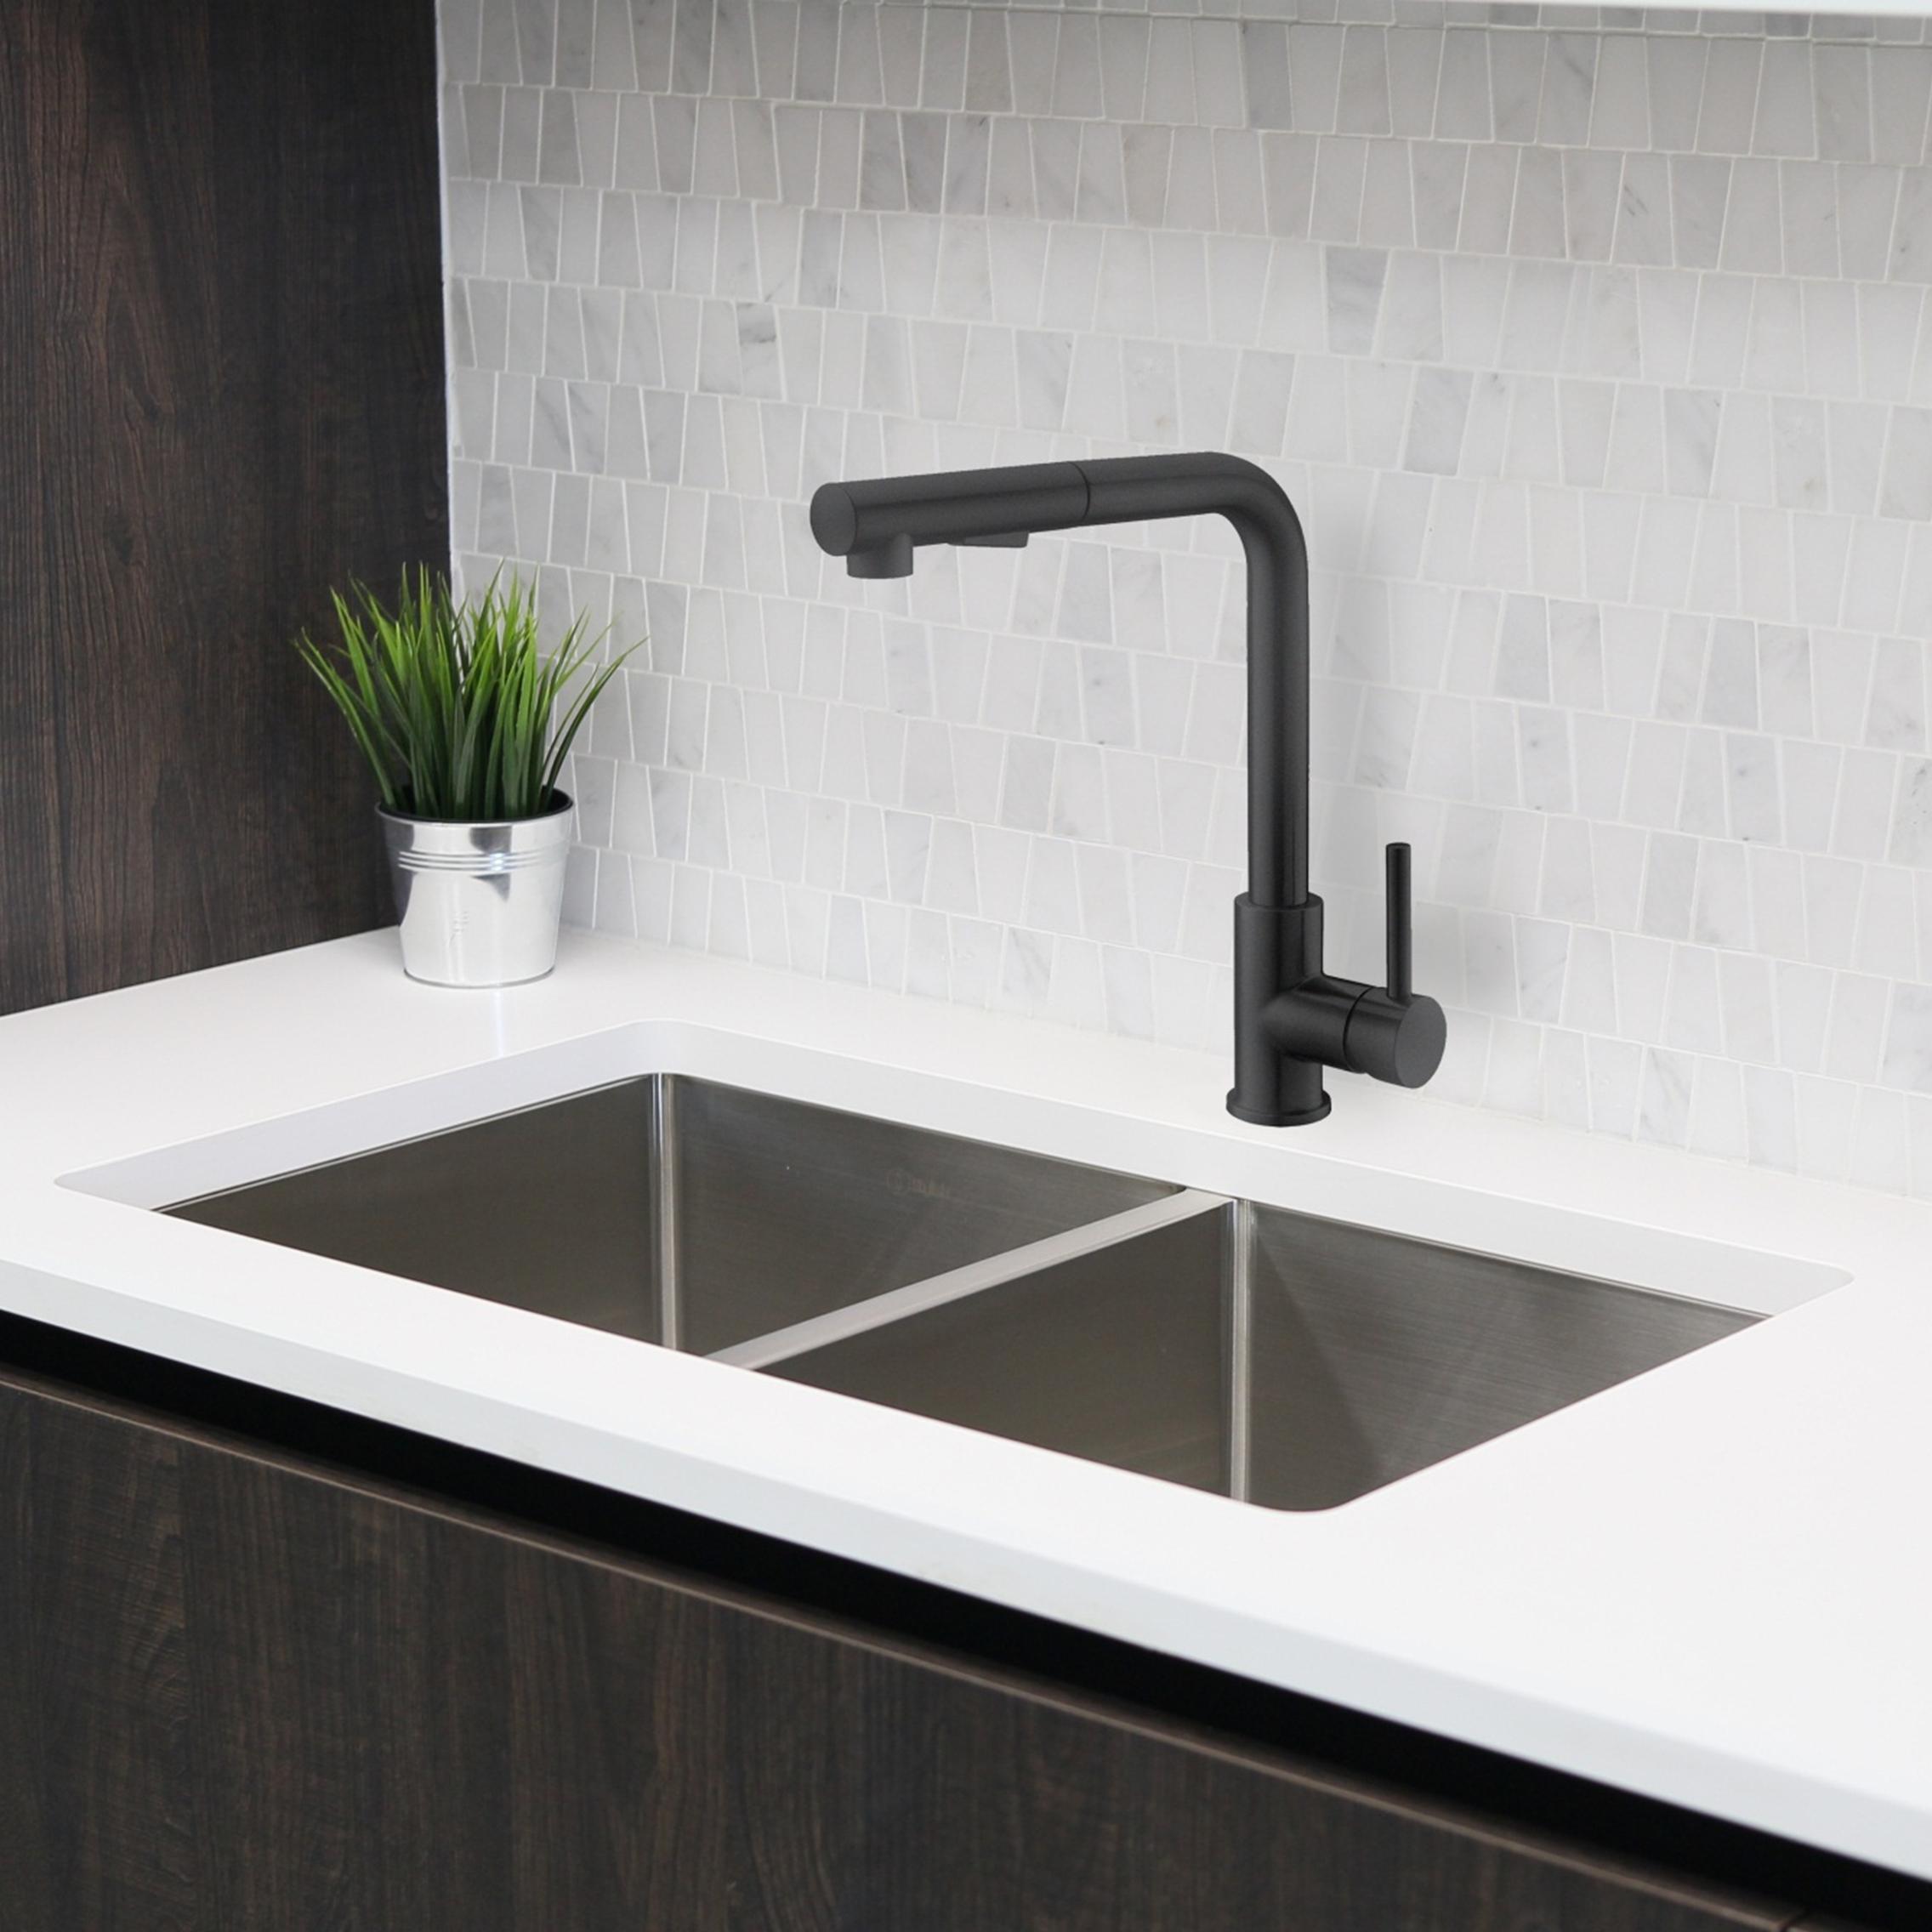 stylish venezia k 130n pull down matte black kitchen faucet